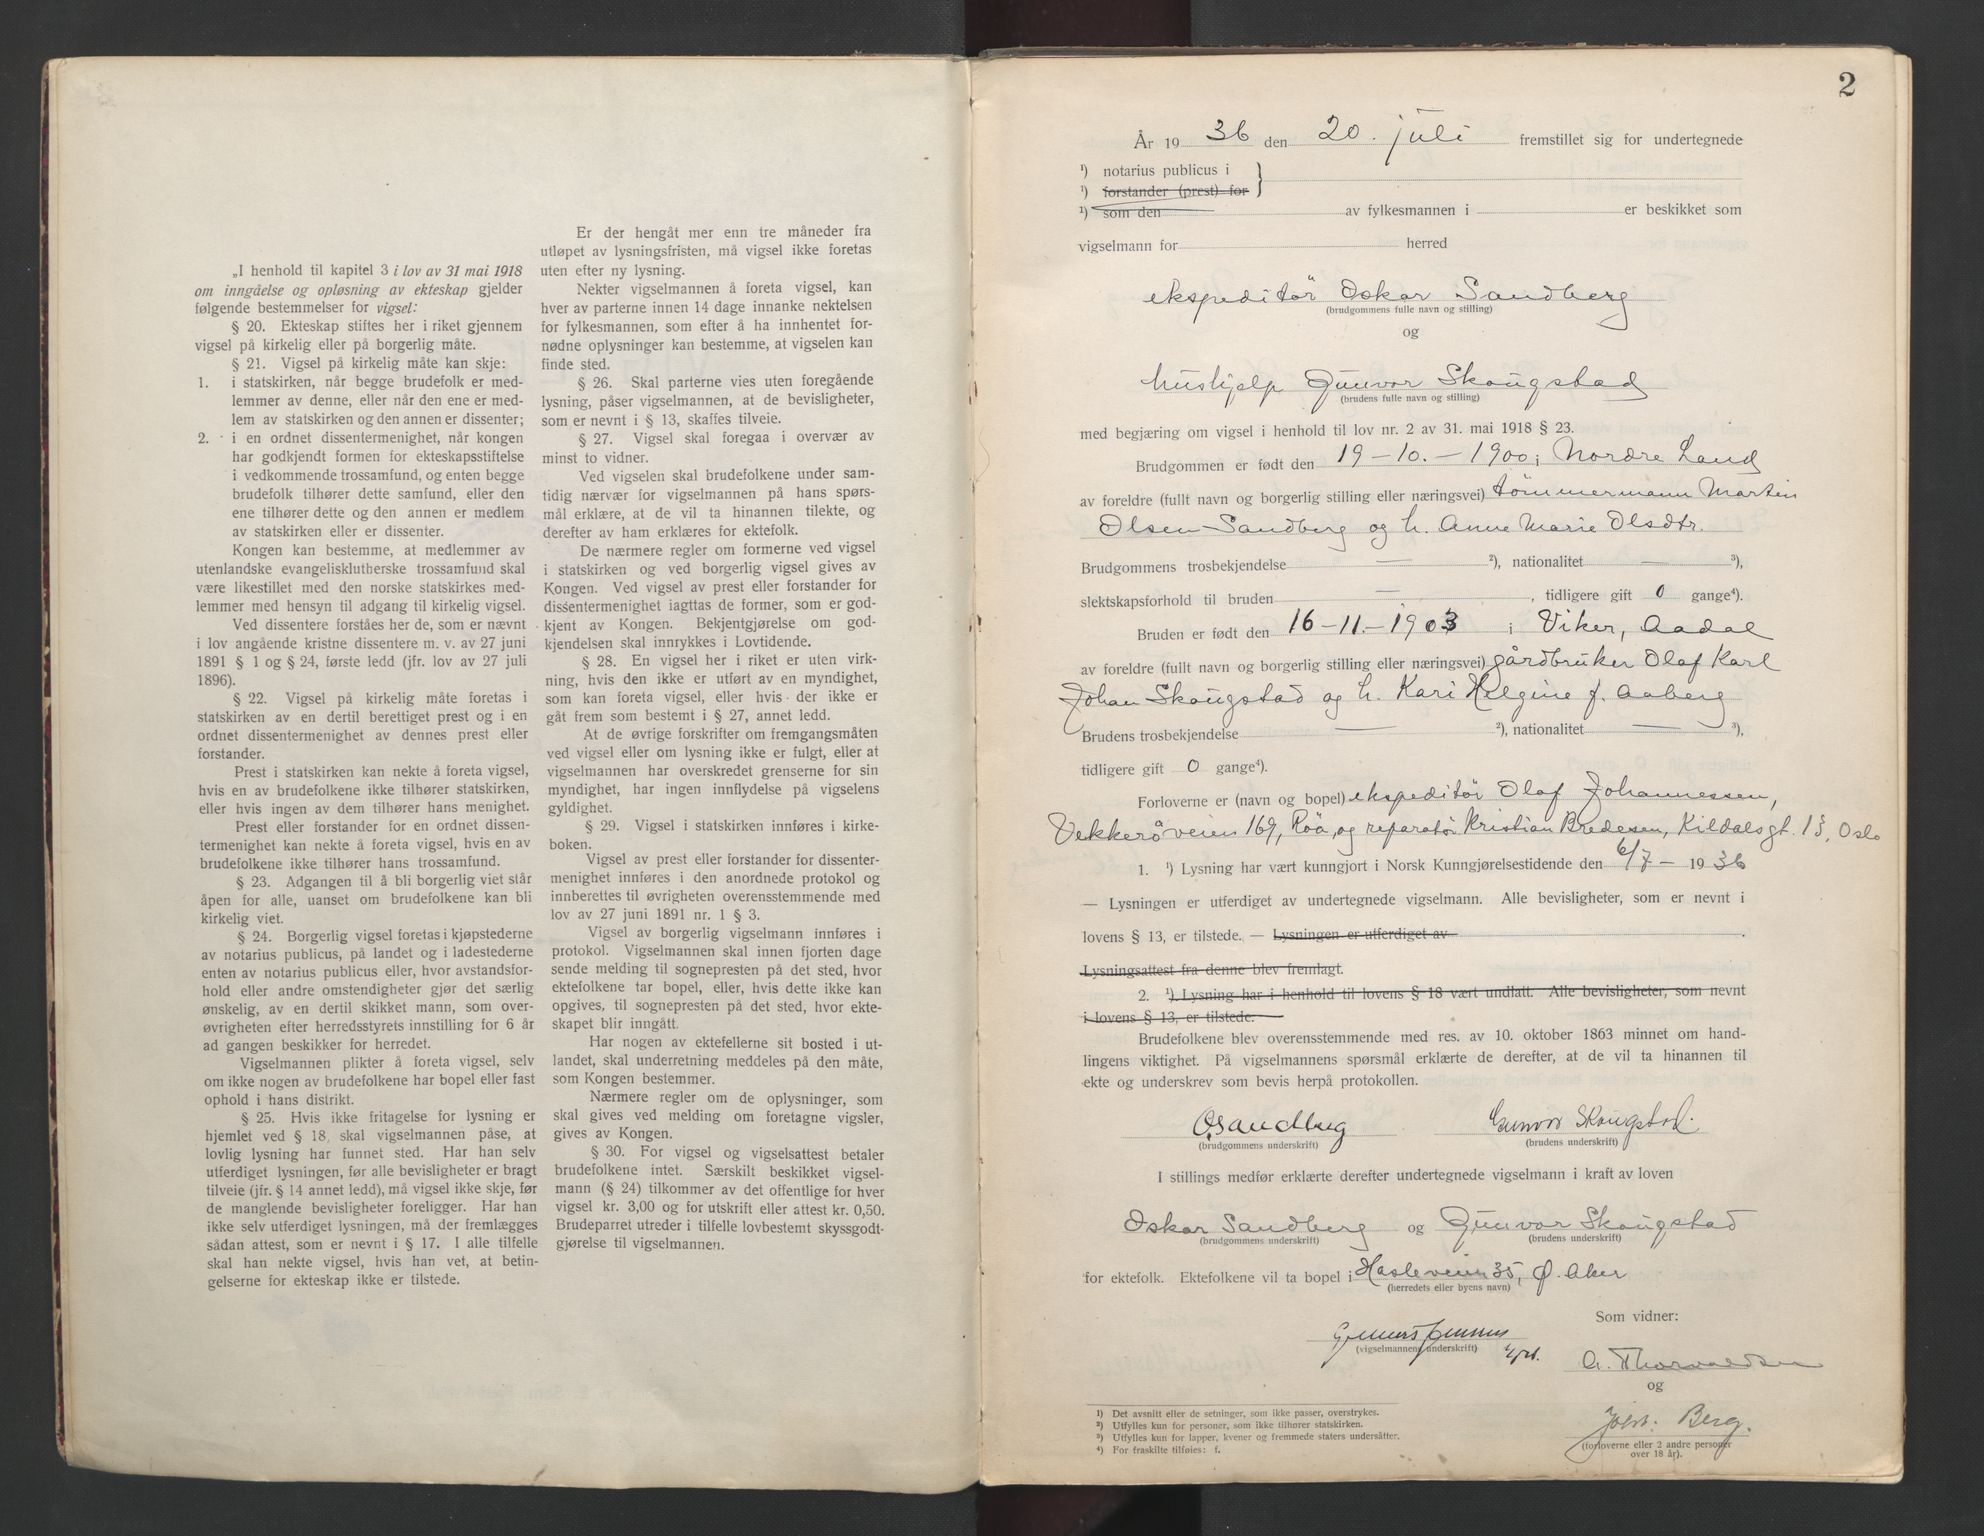 SAO, Aker sorenskriveri, L/Lc/Lcb/L0009: Vigselprotokoll, 1936-1937, s. 2